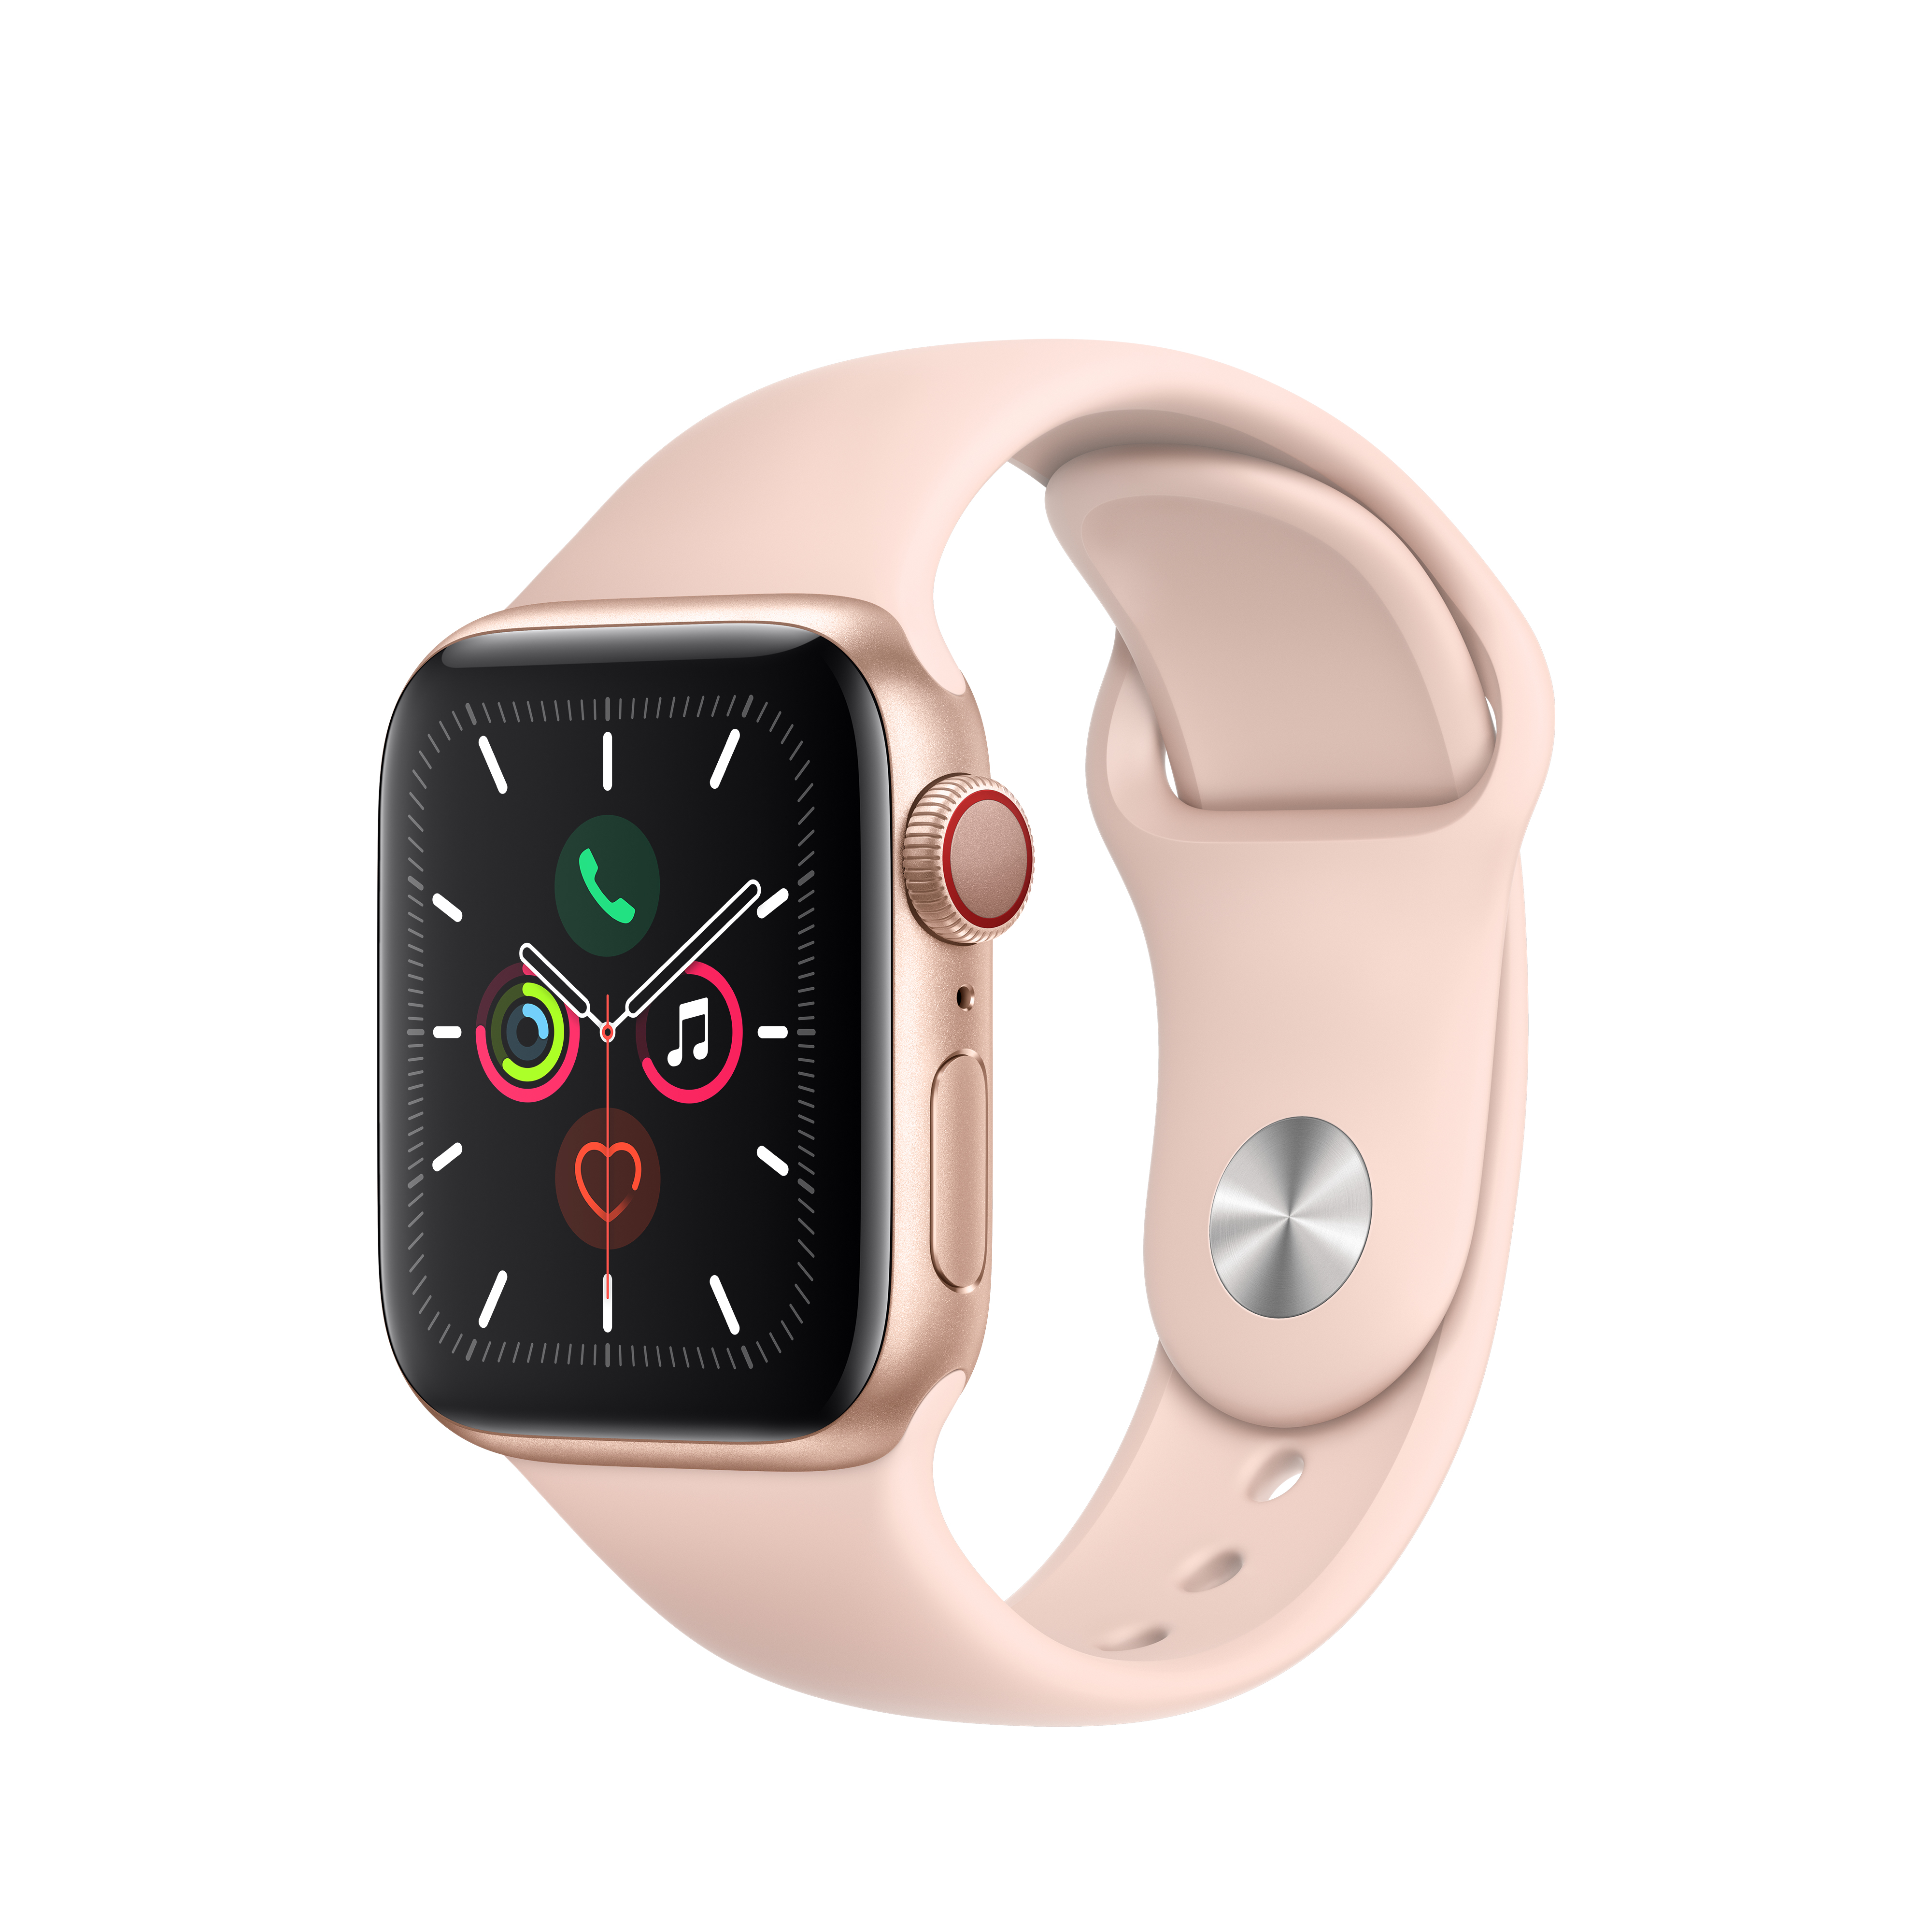 Apple 애플워치5 GPS + 셀룰러 40mm 스포츠밴드 + 알루미늄케이스, 골드(MWX22KH/A), 핑크 샌드(밴드)